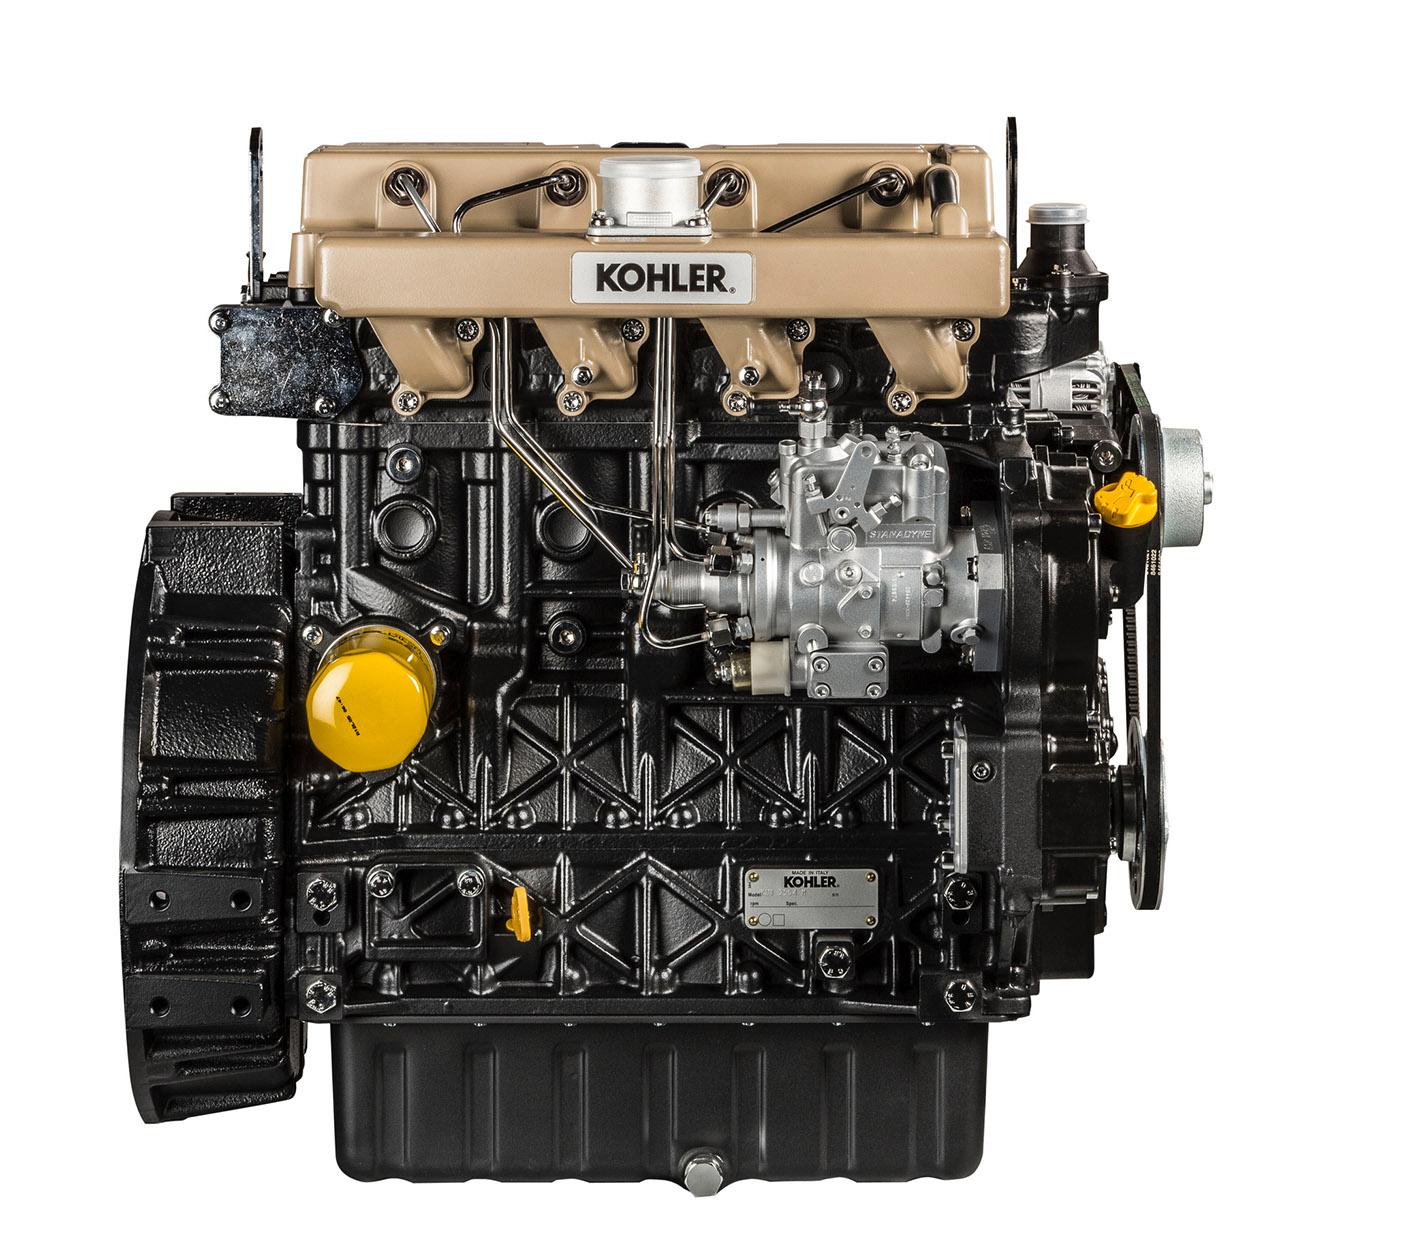 I Motori Kohler per BCS - generatori elettrici Mosa Gruppo BCS Kohler Engines motore KDI motori KOHLER motosaldatrici Mosa -Componenti Notizie - MC5.0-Macchine Cantieri 5